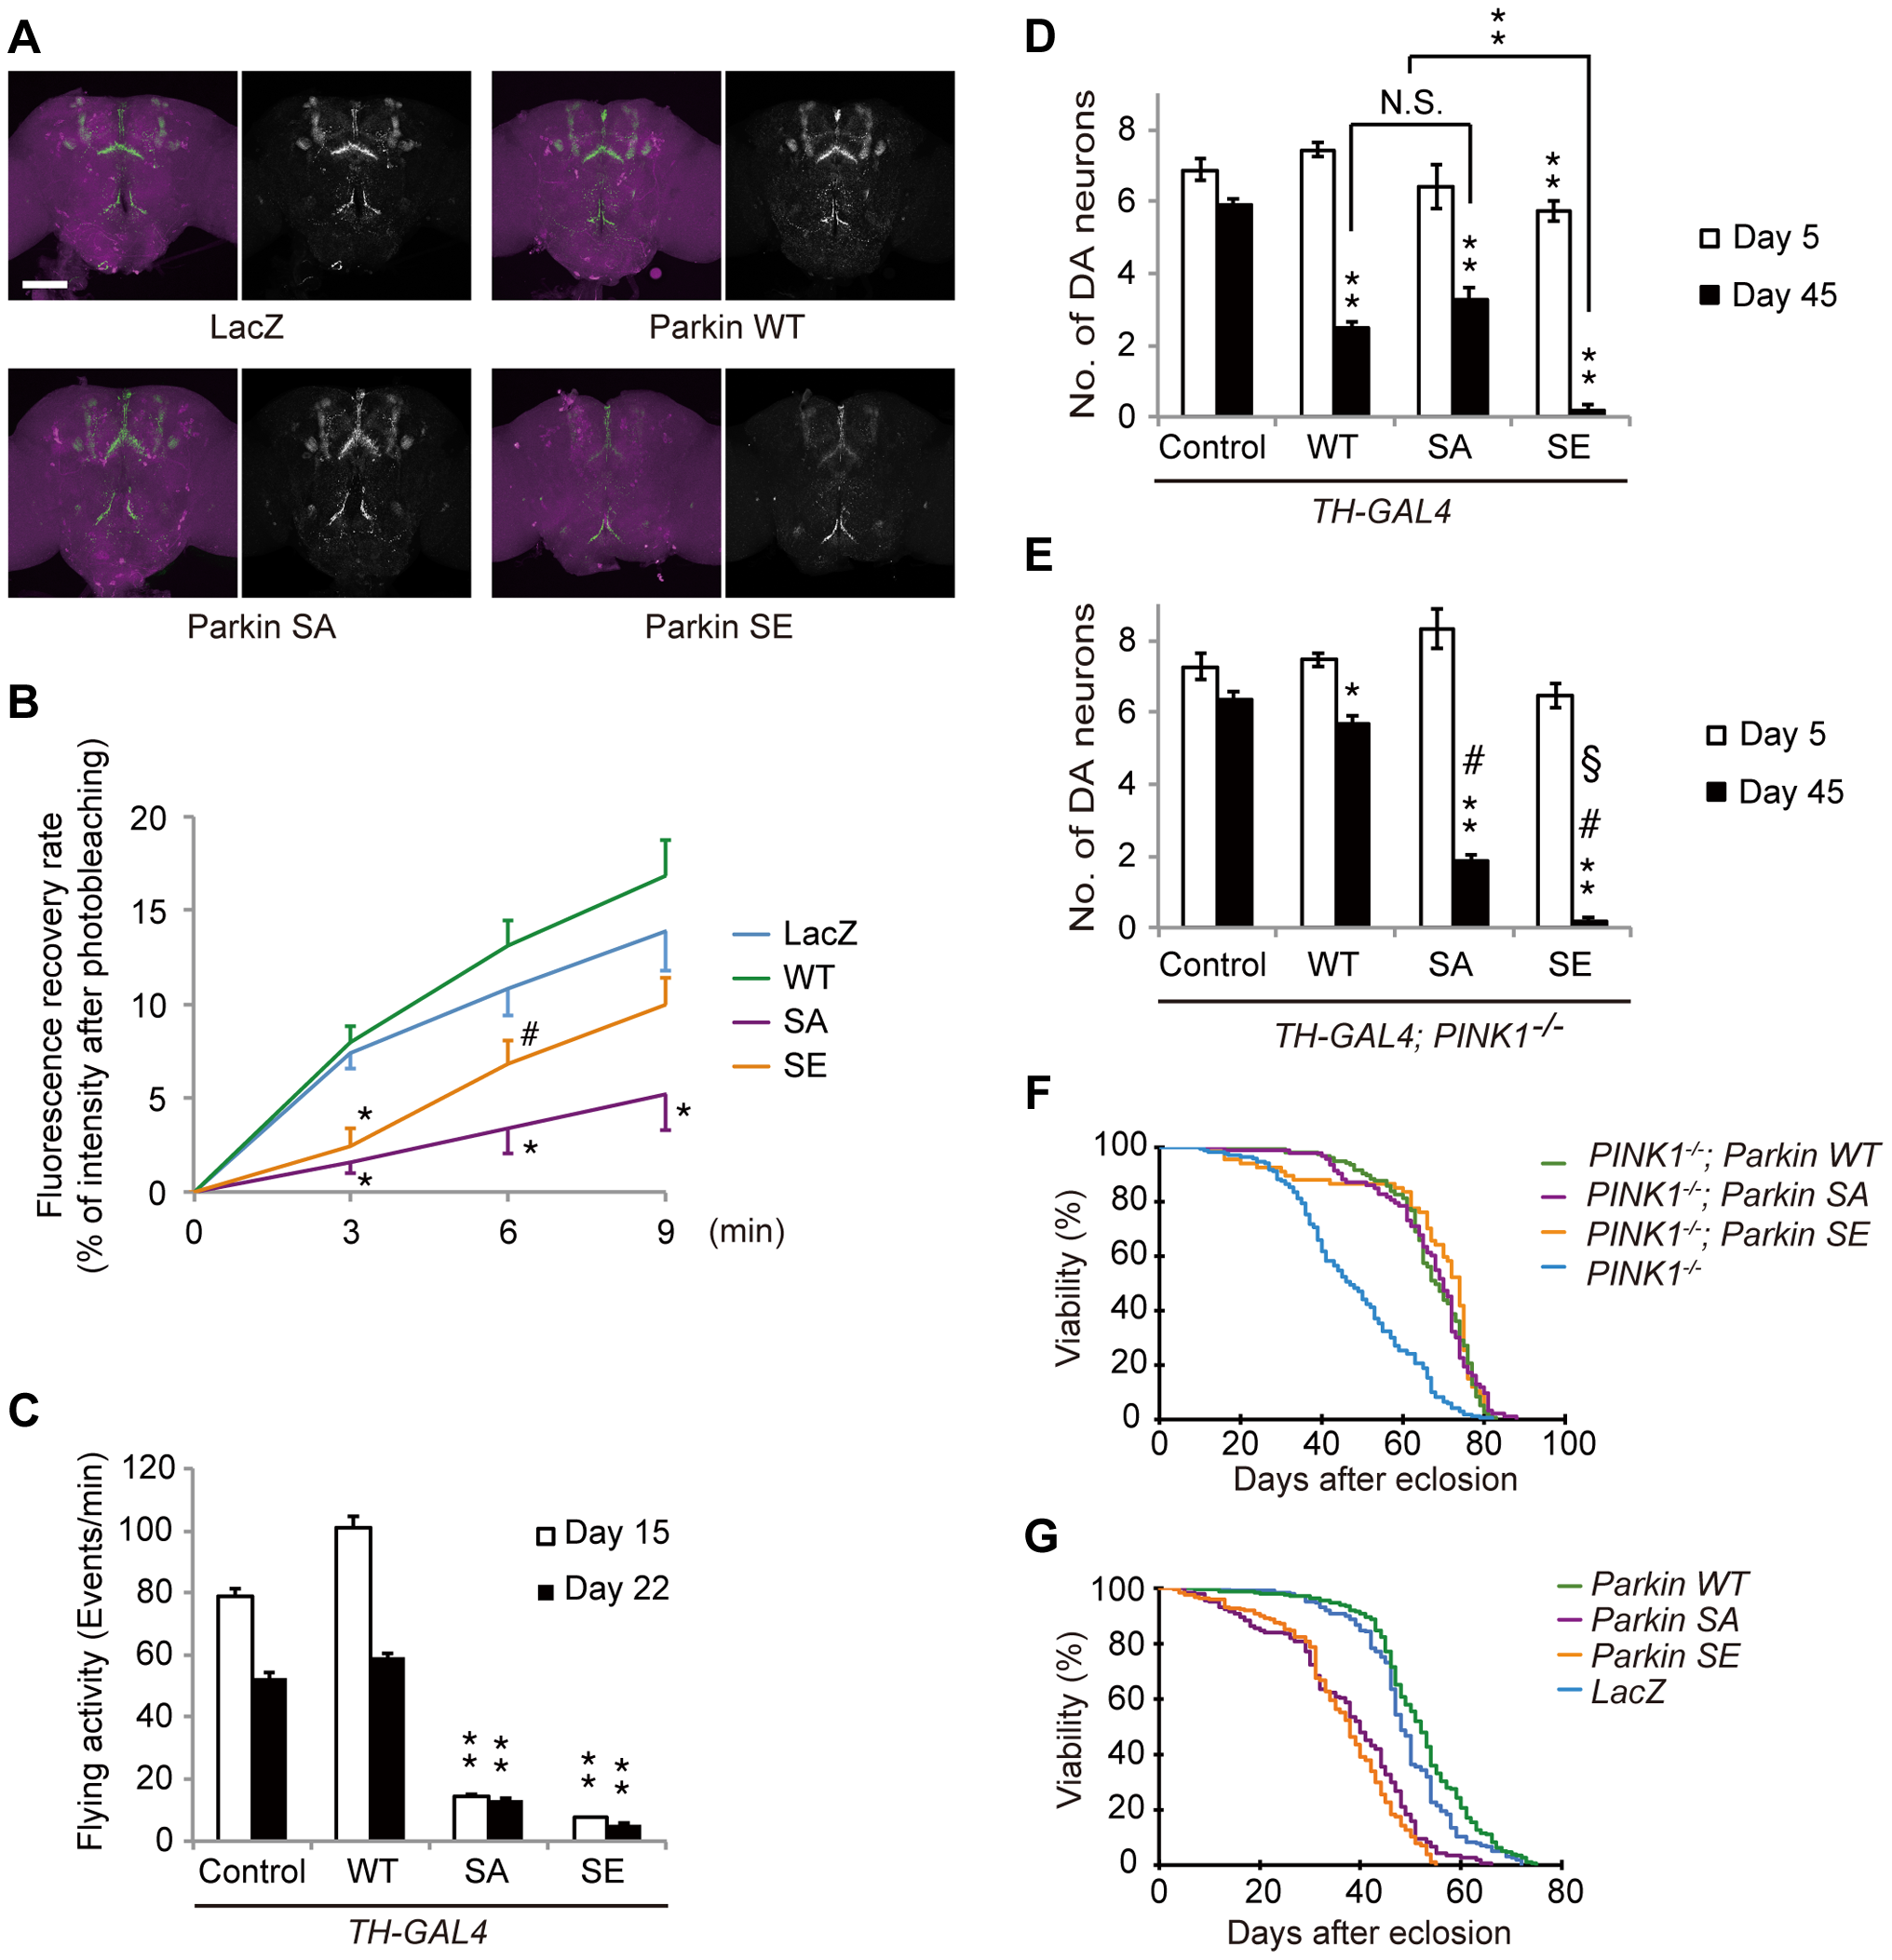 Parkin phosphorylation modulates dopaminergic function and survivability of DA neurons.